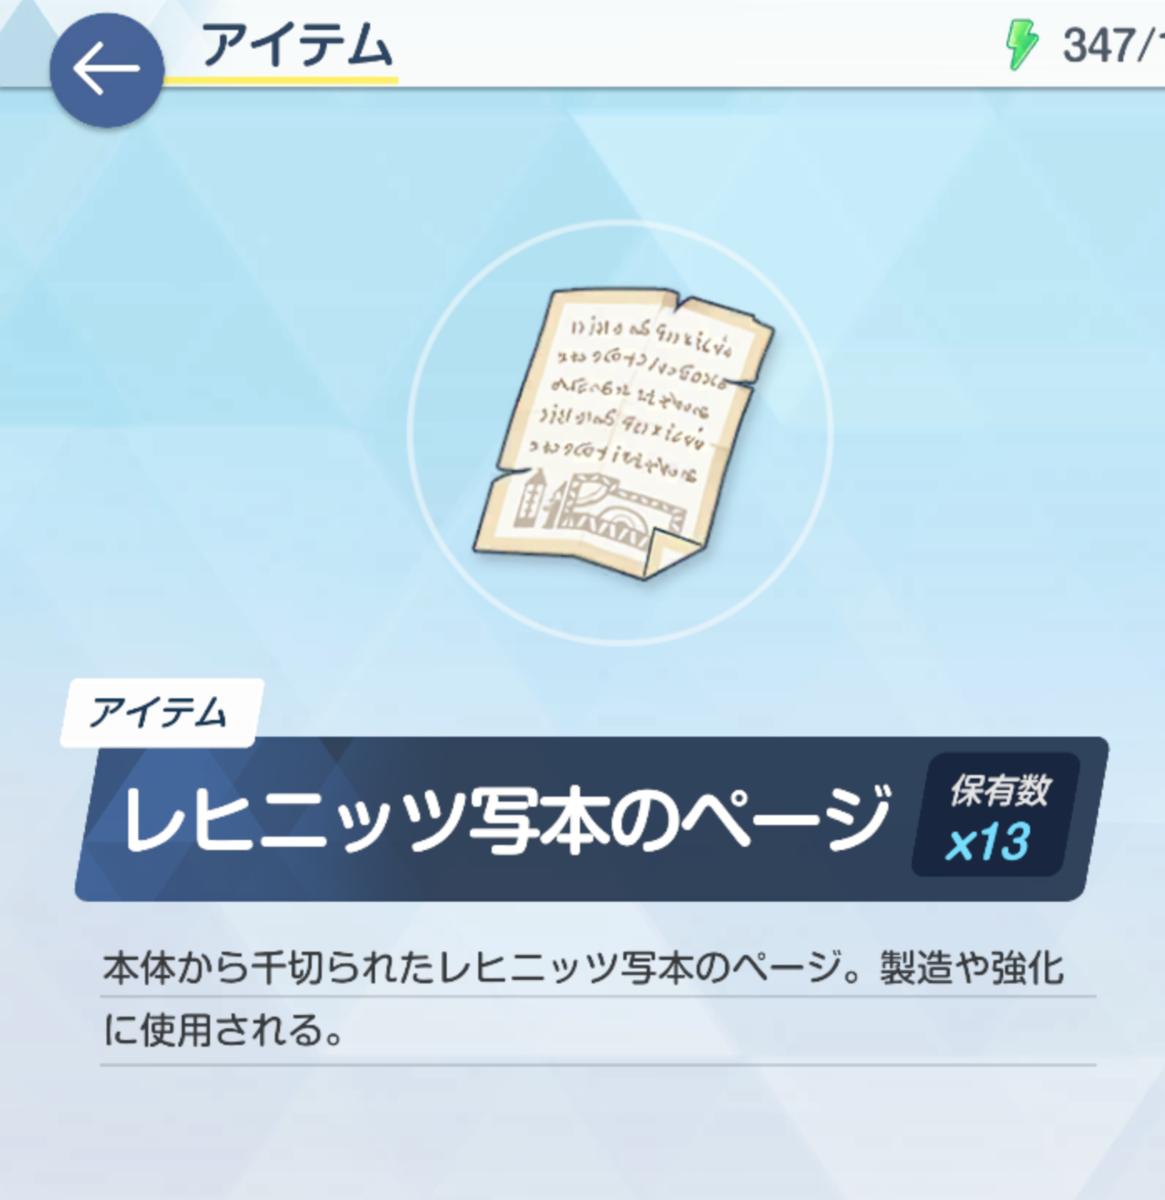 f:id:ichi1223:20210223034748p:plain